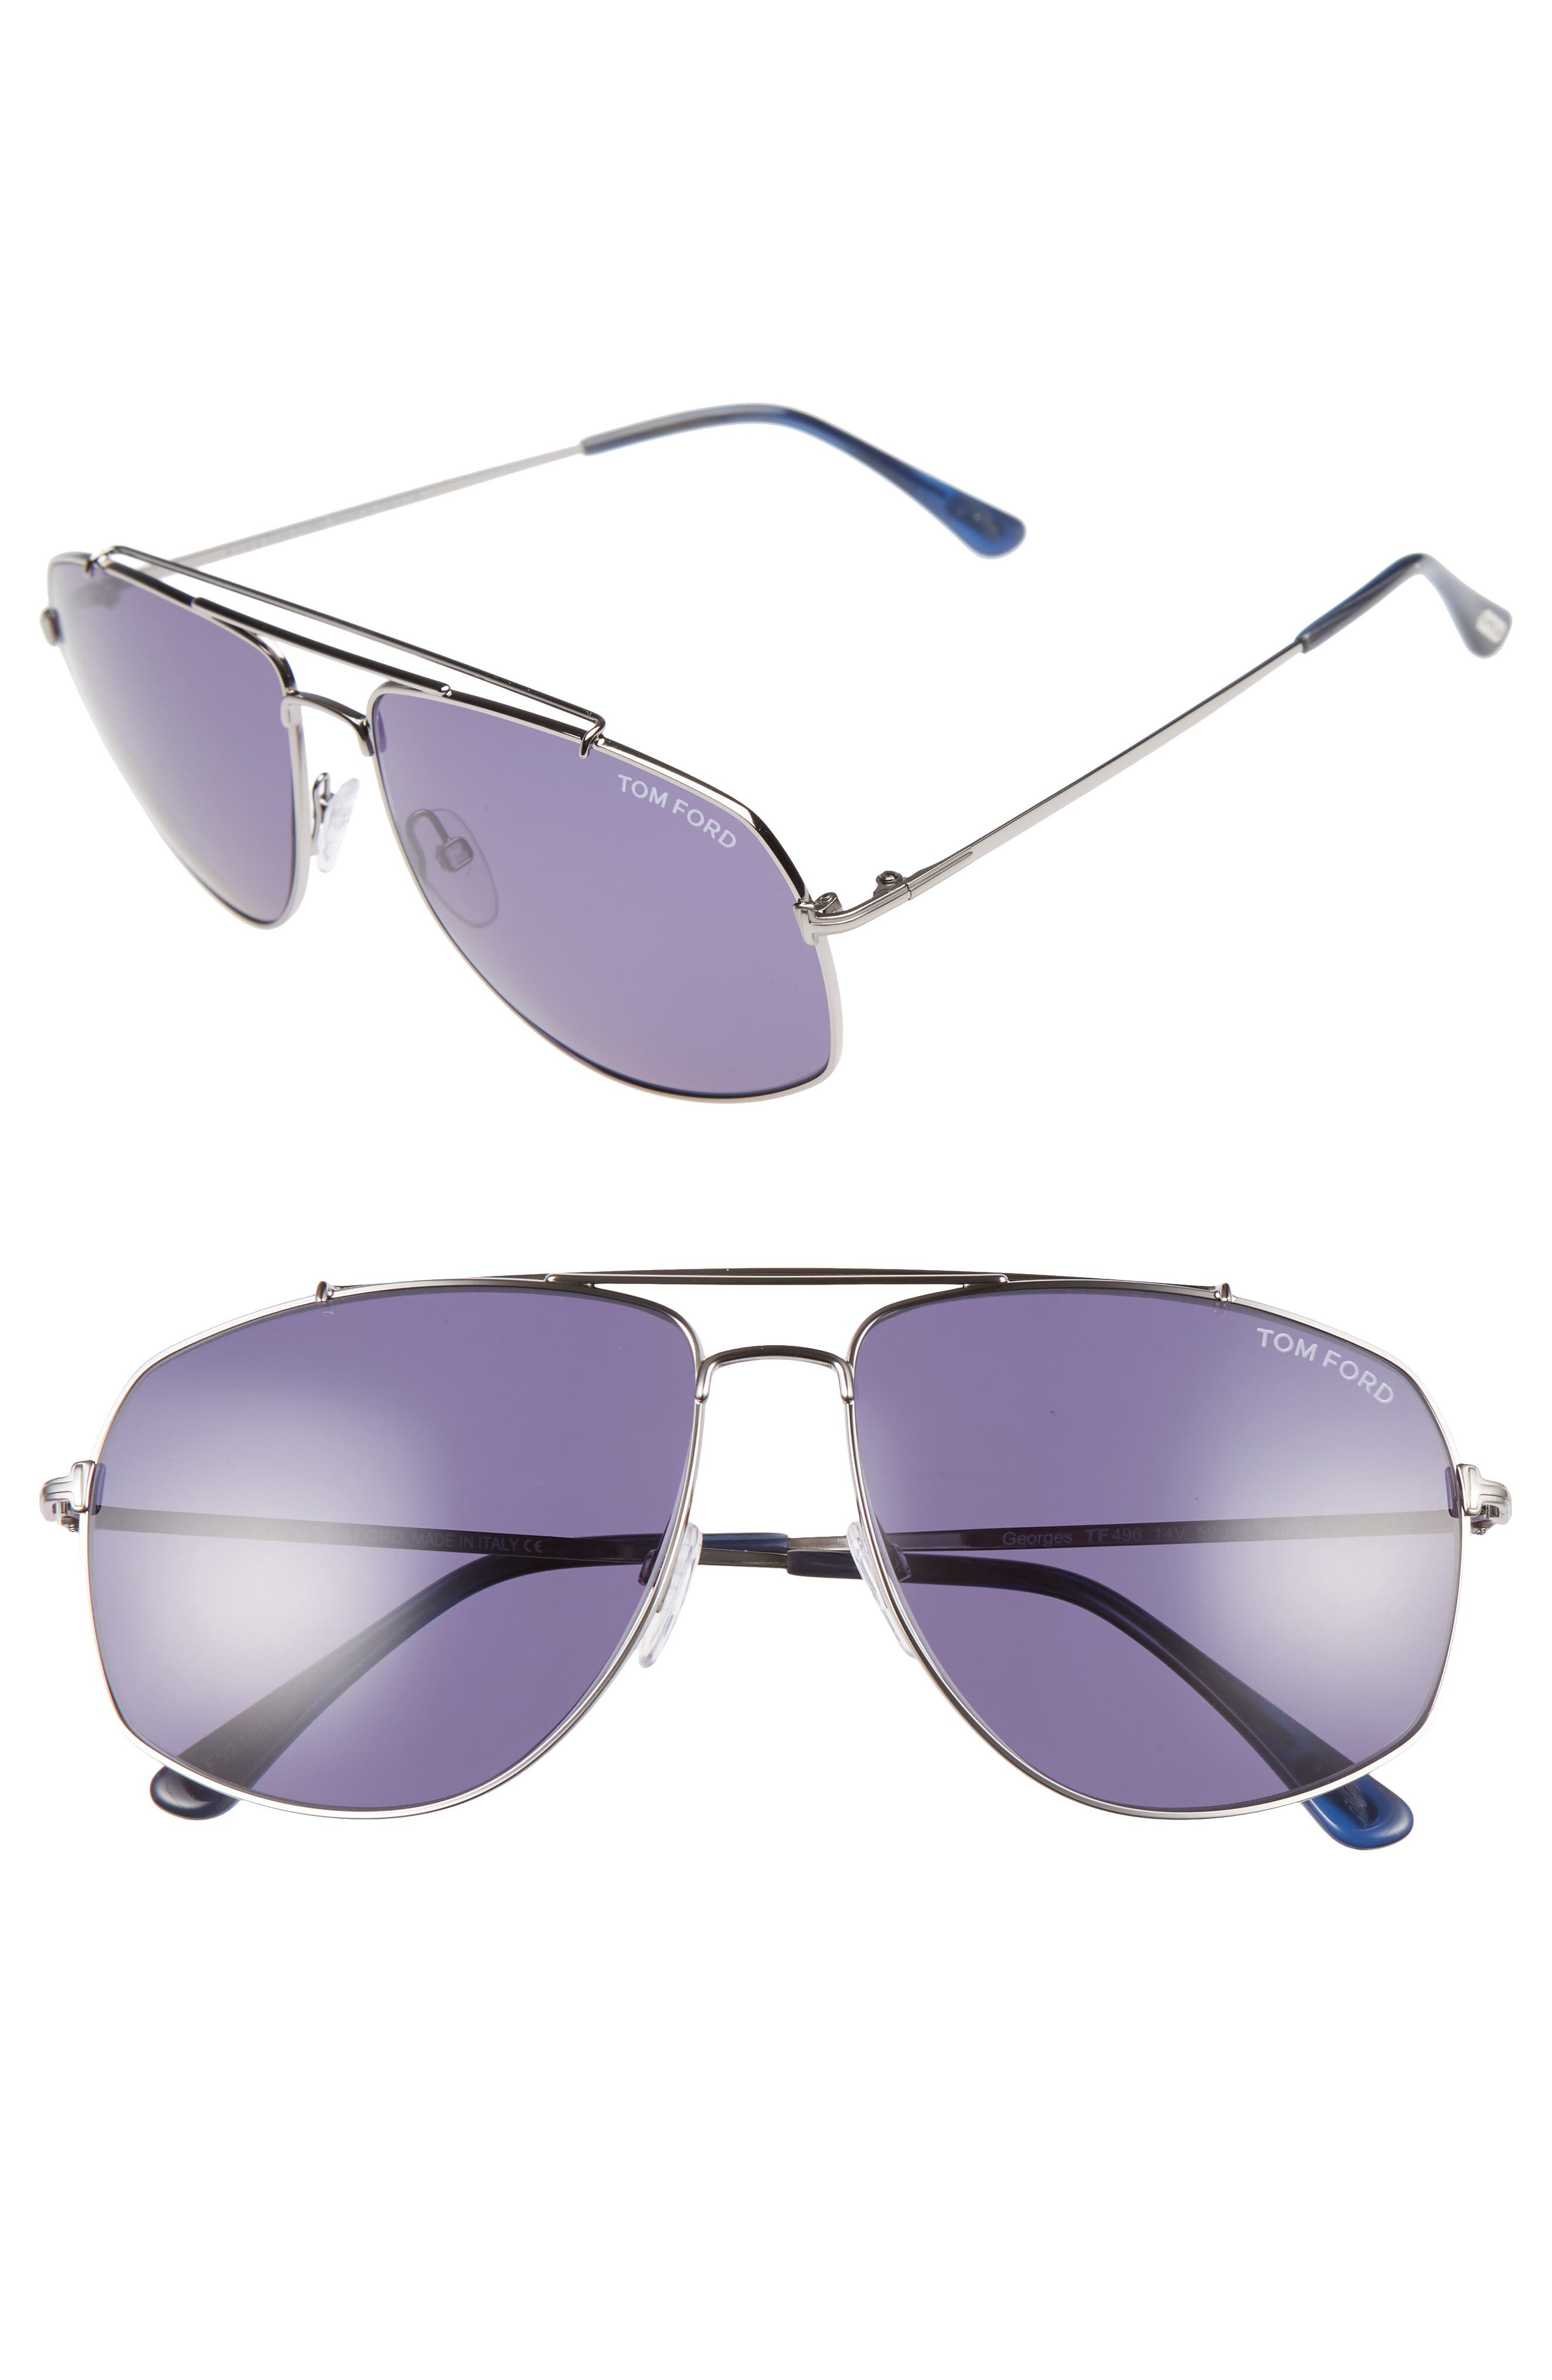 59mm Aviator Sunglasses,                             Main thumbnail 1, color,                             Silver/ Blue